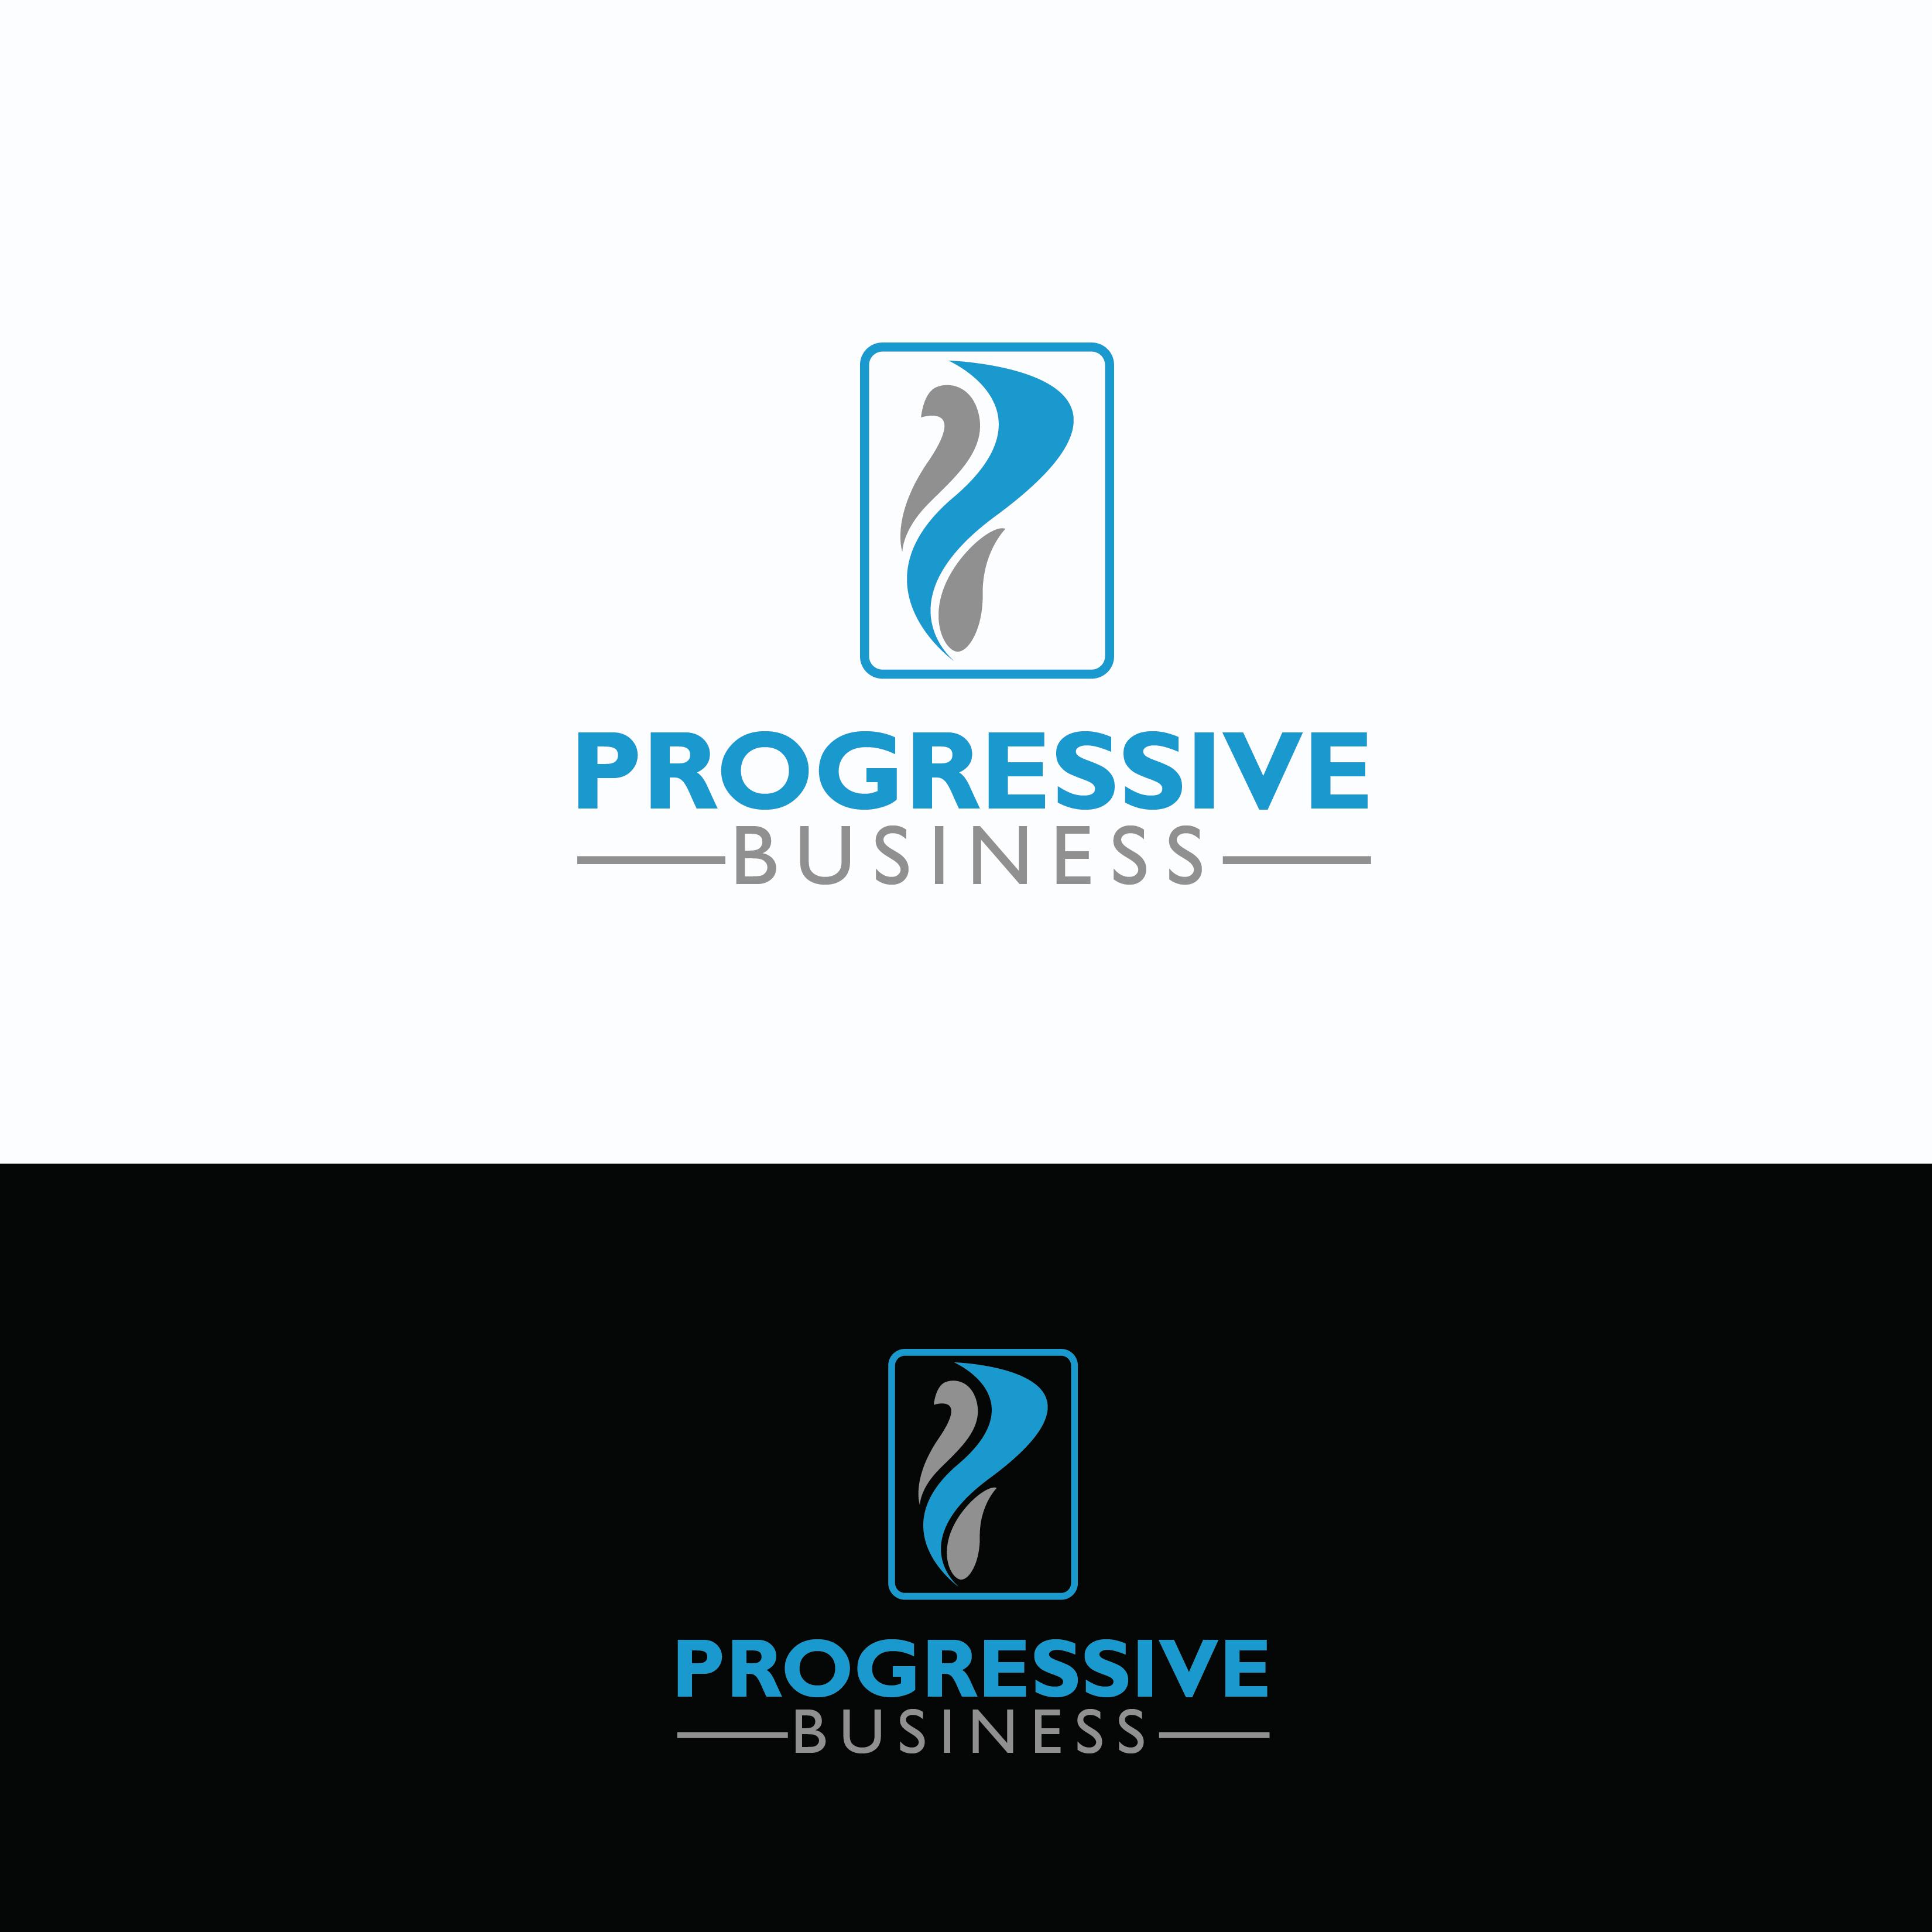 Logo Design by Private User - Entry No. 120 in the Logo Design Contest Captivating Logo Design for Progressive Business.